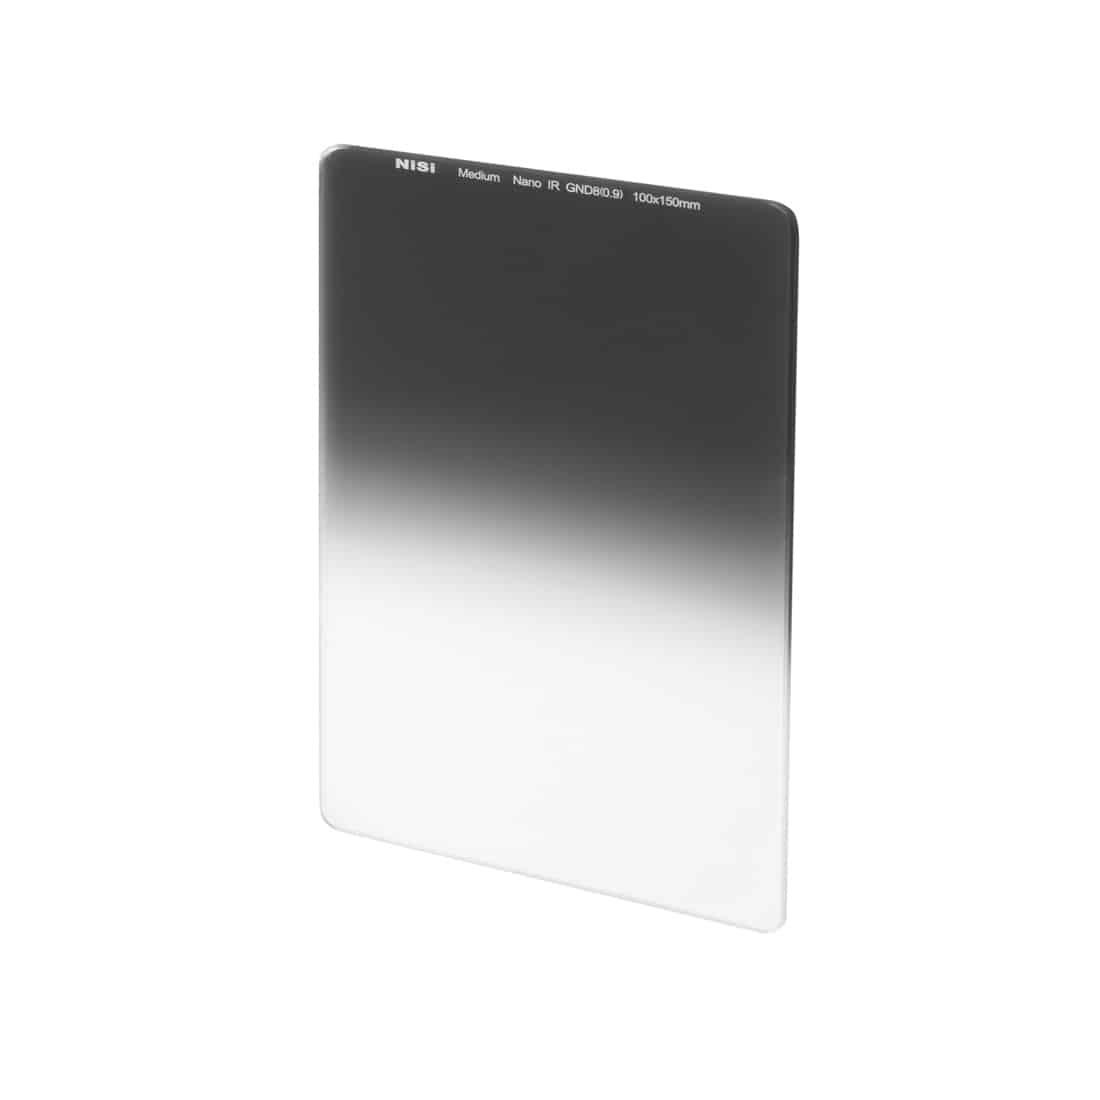 Filtre NiSi Dégradé GND4 (0.6) 2 Stops MEDIUM 100x150mm